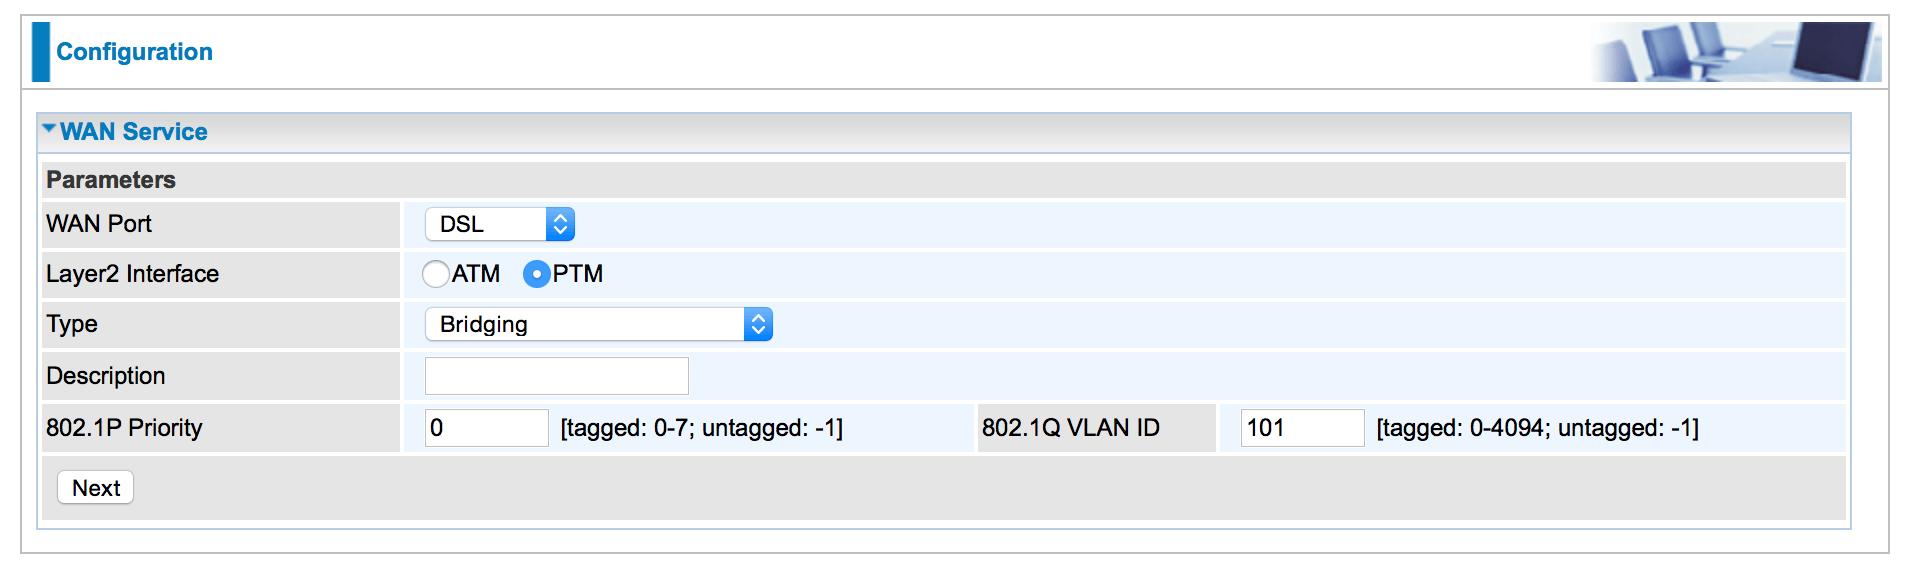 8800 WAN configuration